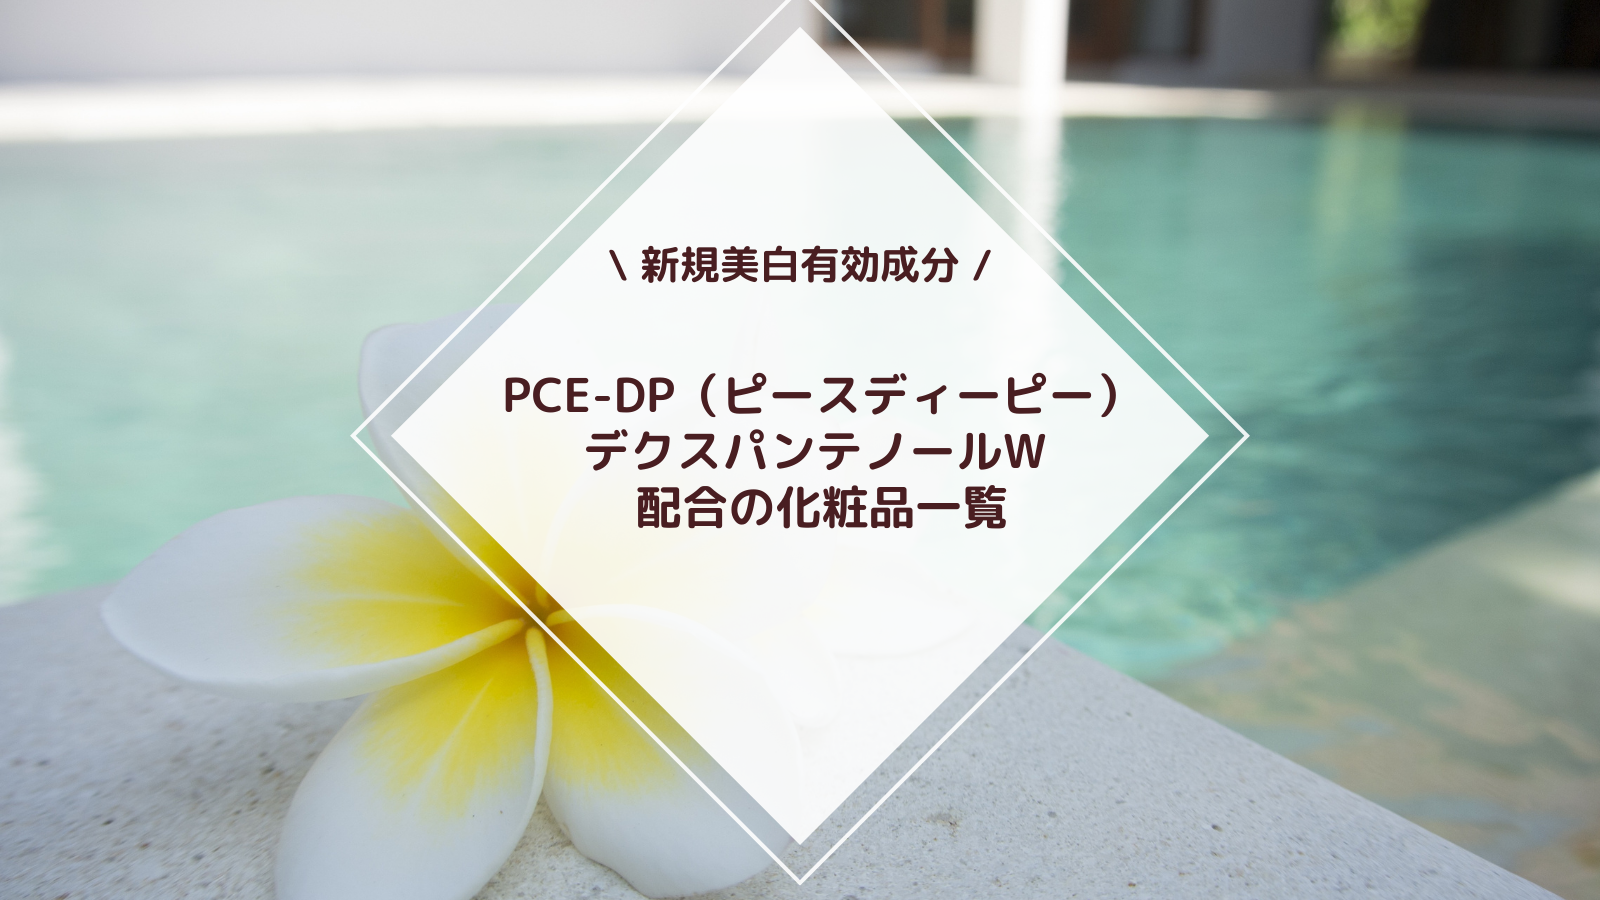 PCE-DP(ピースディーピー):デクスパンテノールW 配合の化粧品一覧のアイキャッチ画像